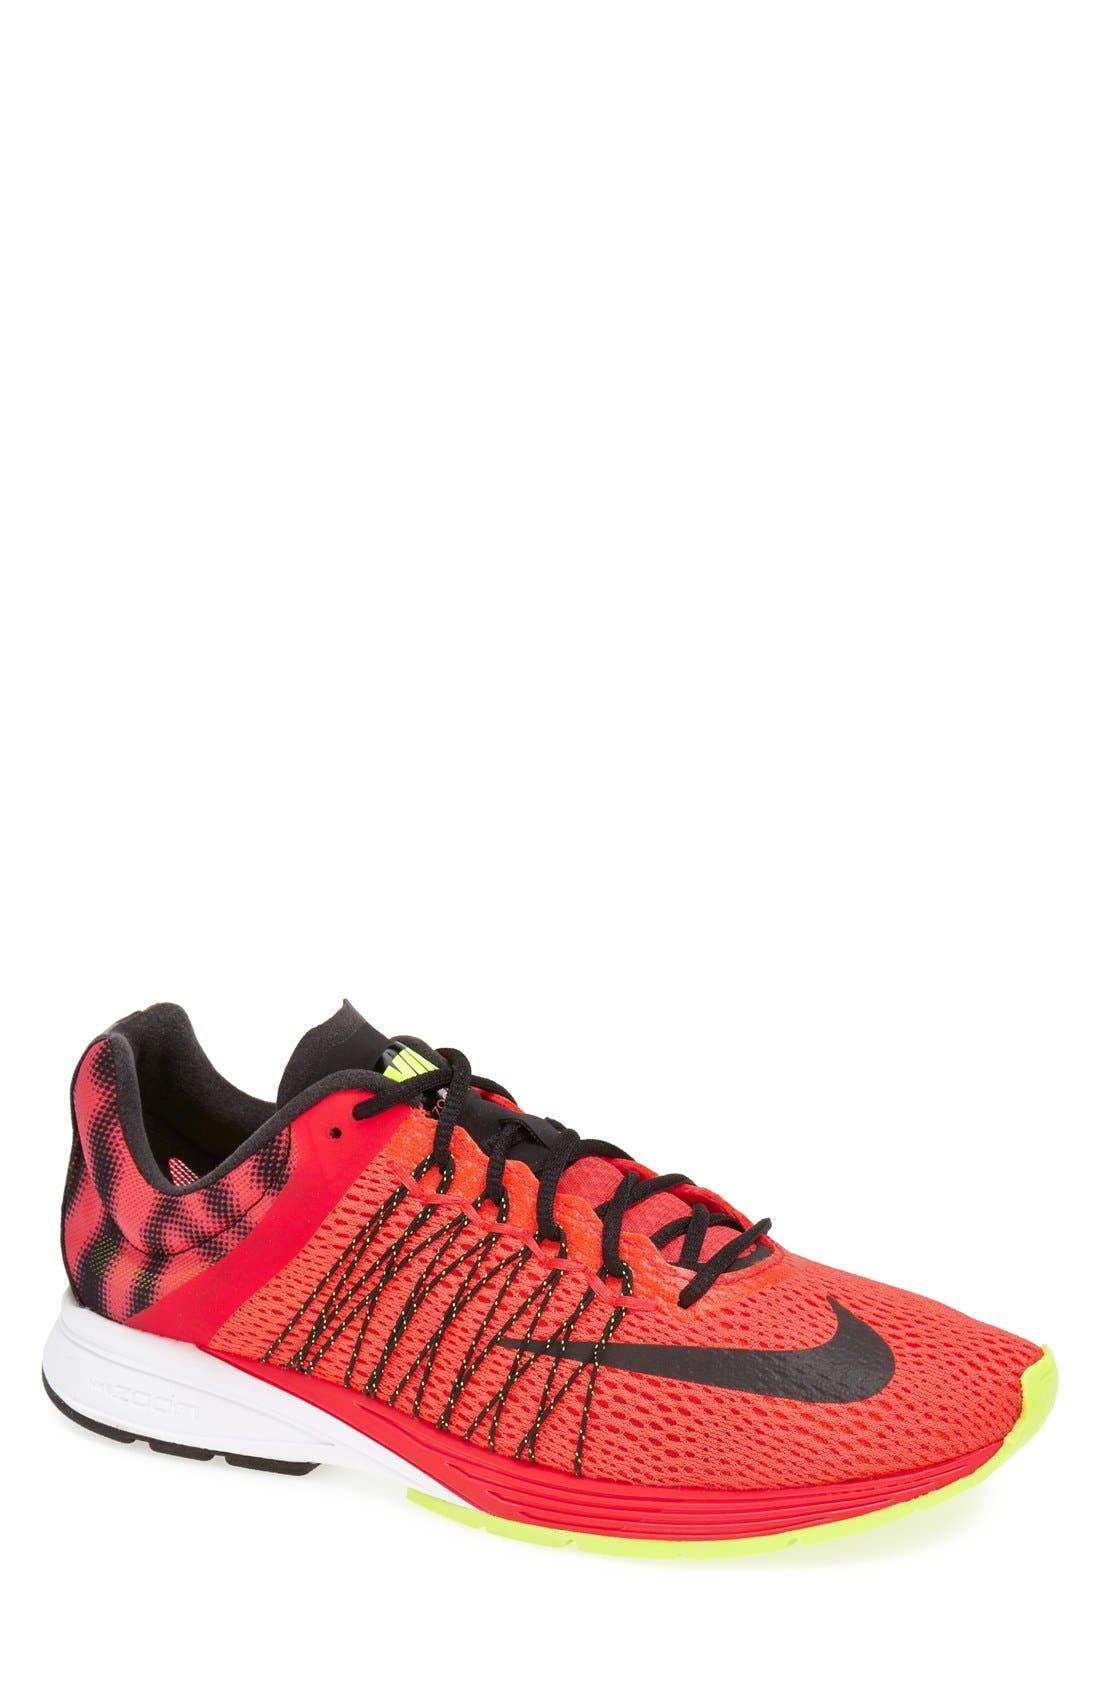 Alternate Image 1 Selected - Nike 'Zoom Streak 5' Running Shoe (Men)